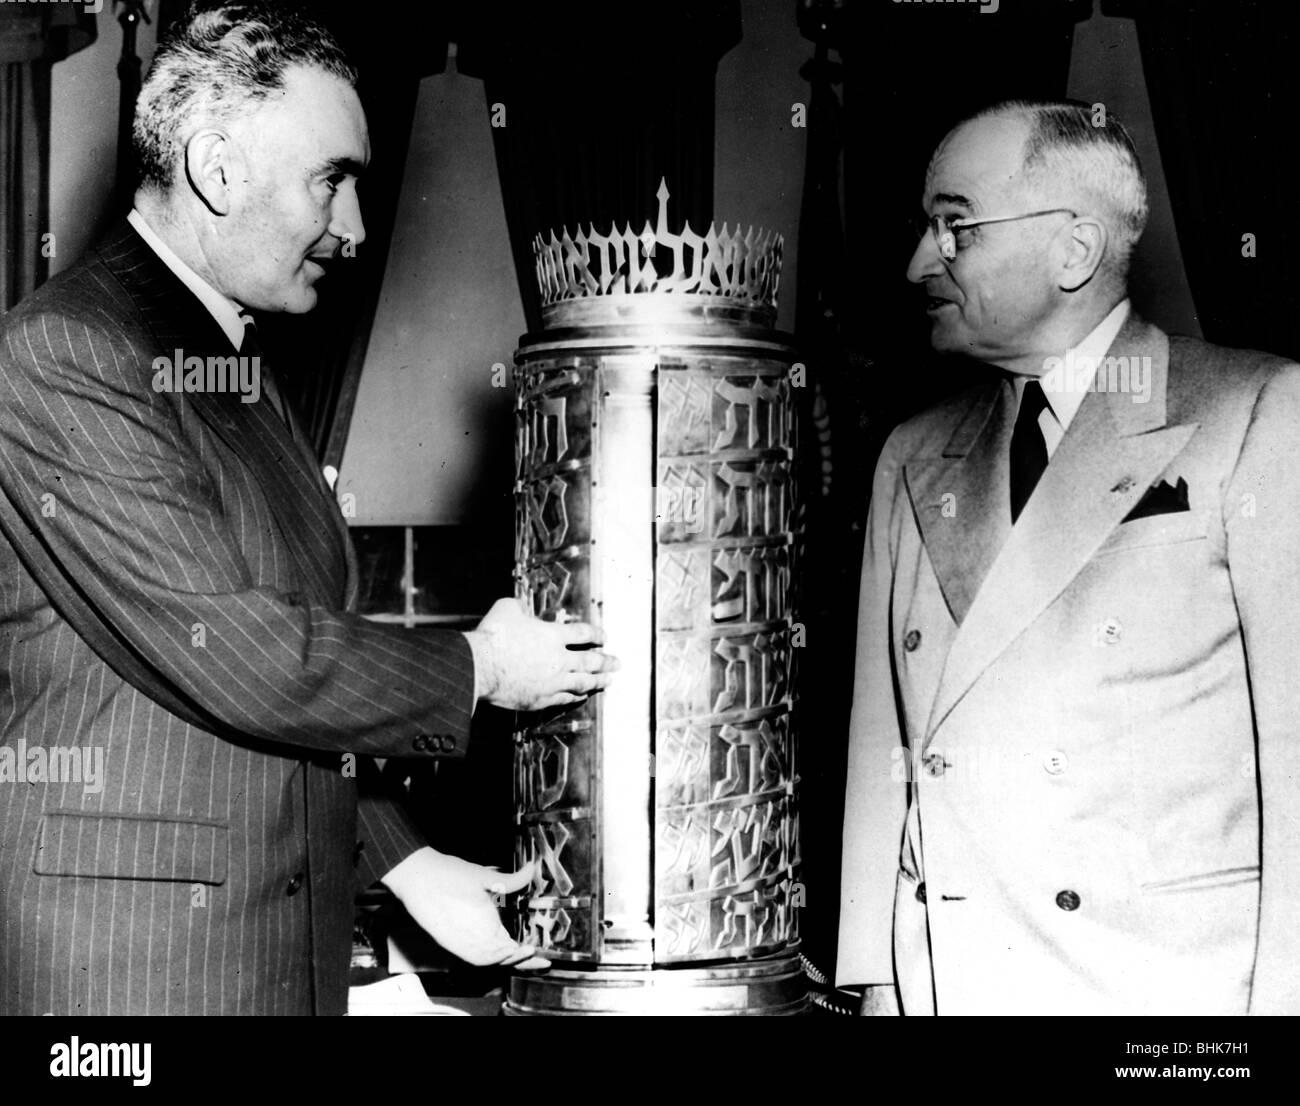 Ambassador Elath makes presentation to President Harry Truman. - Stock Image